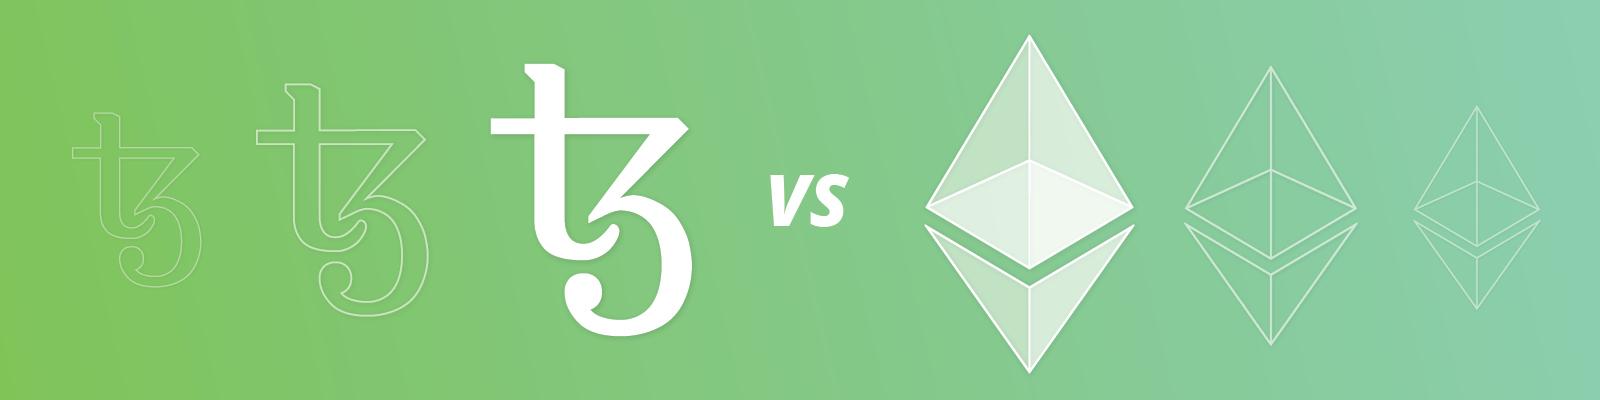 Tezos vs Ethereum